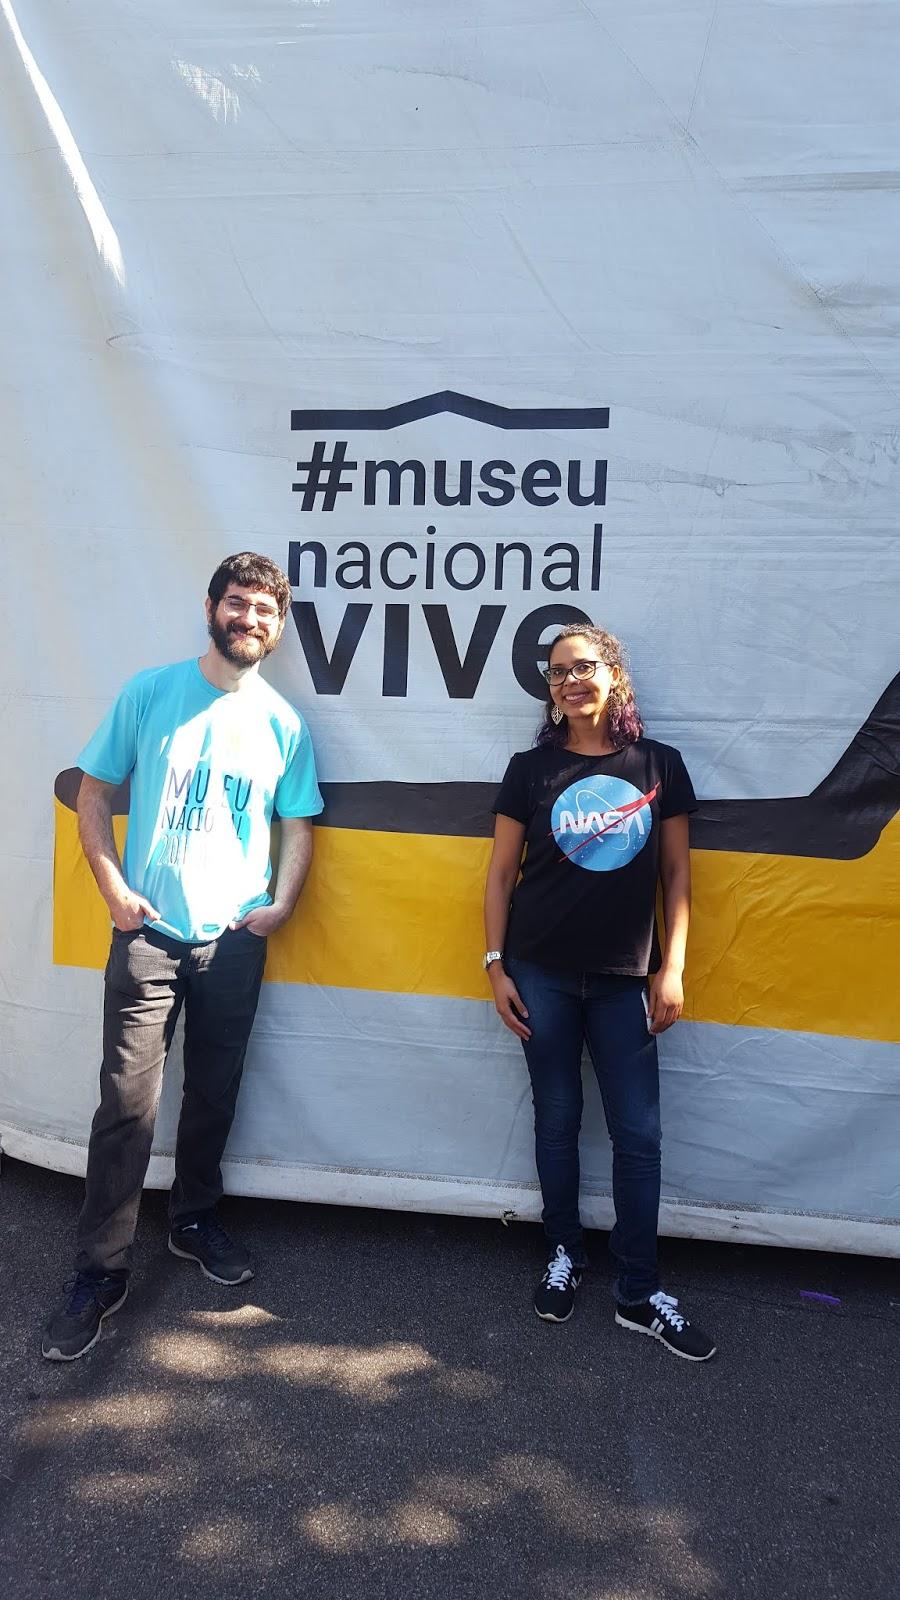 Museu Nacional Vive